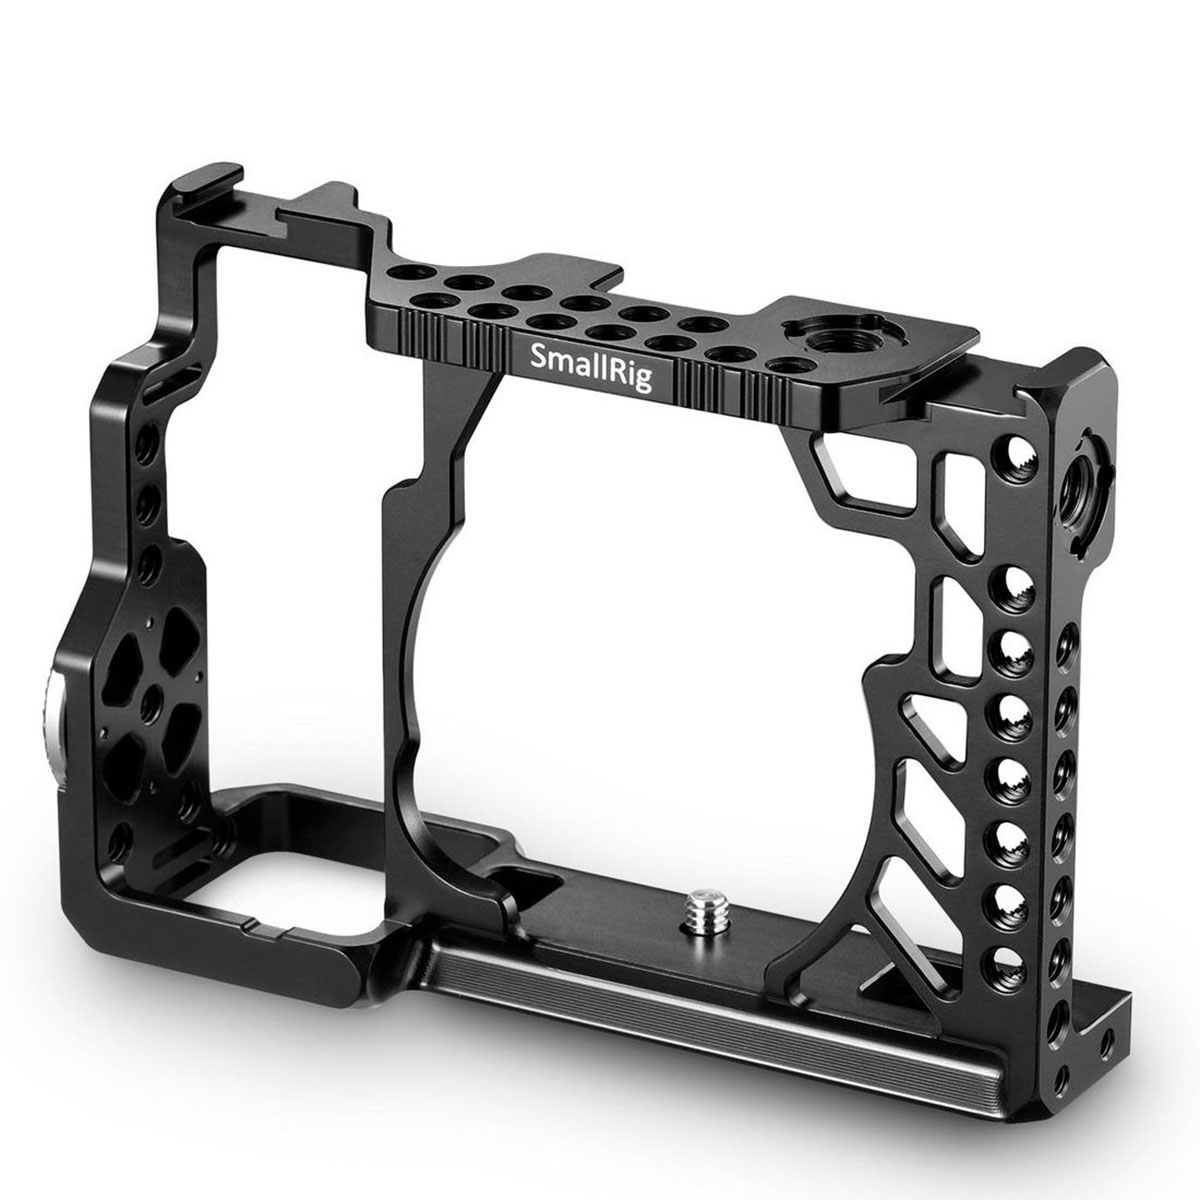 SmallRig Cage für Sony A7 / A7S / A7R 1815